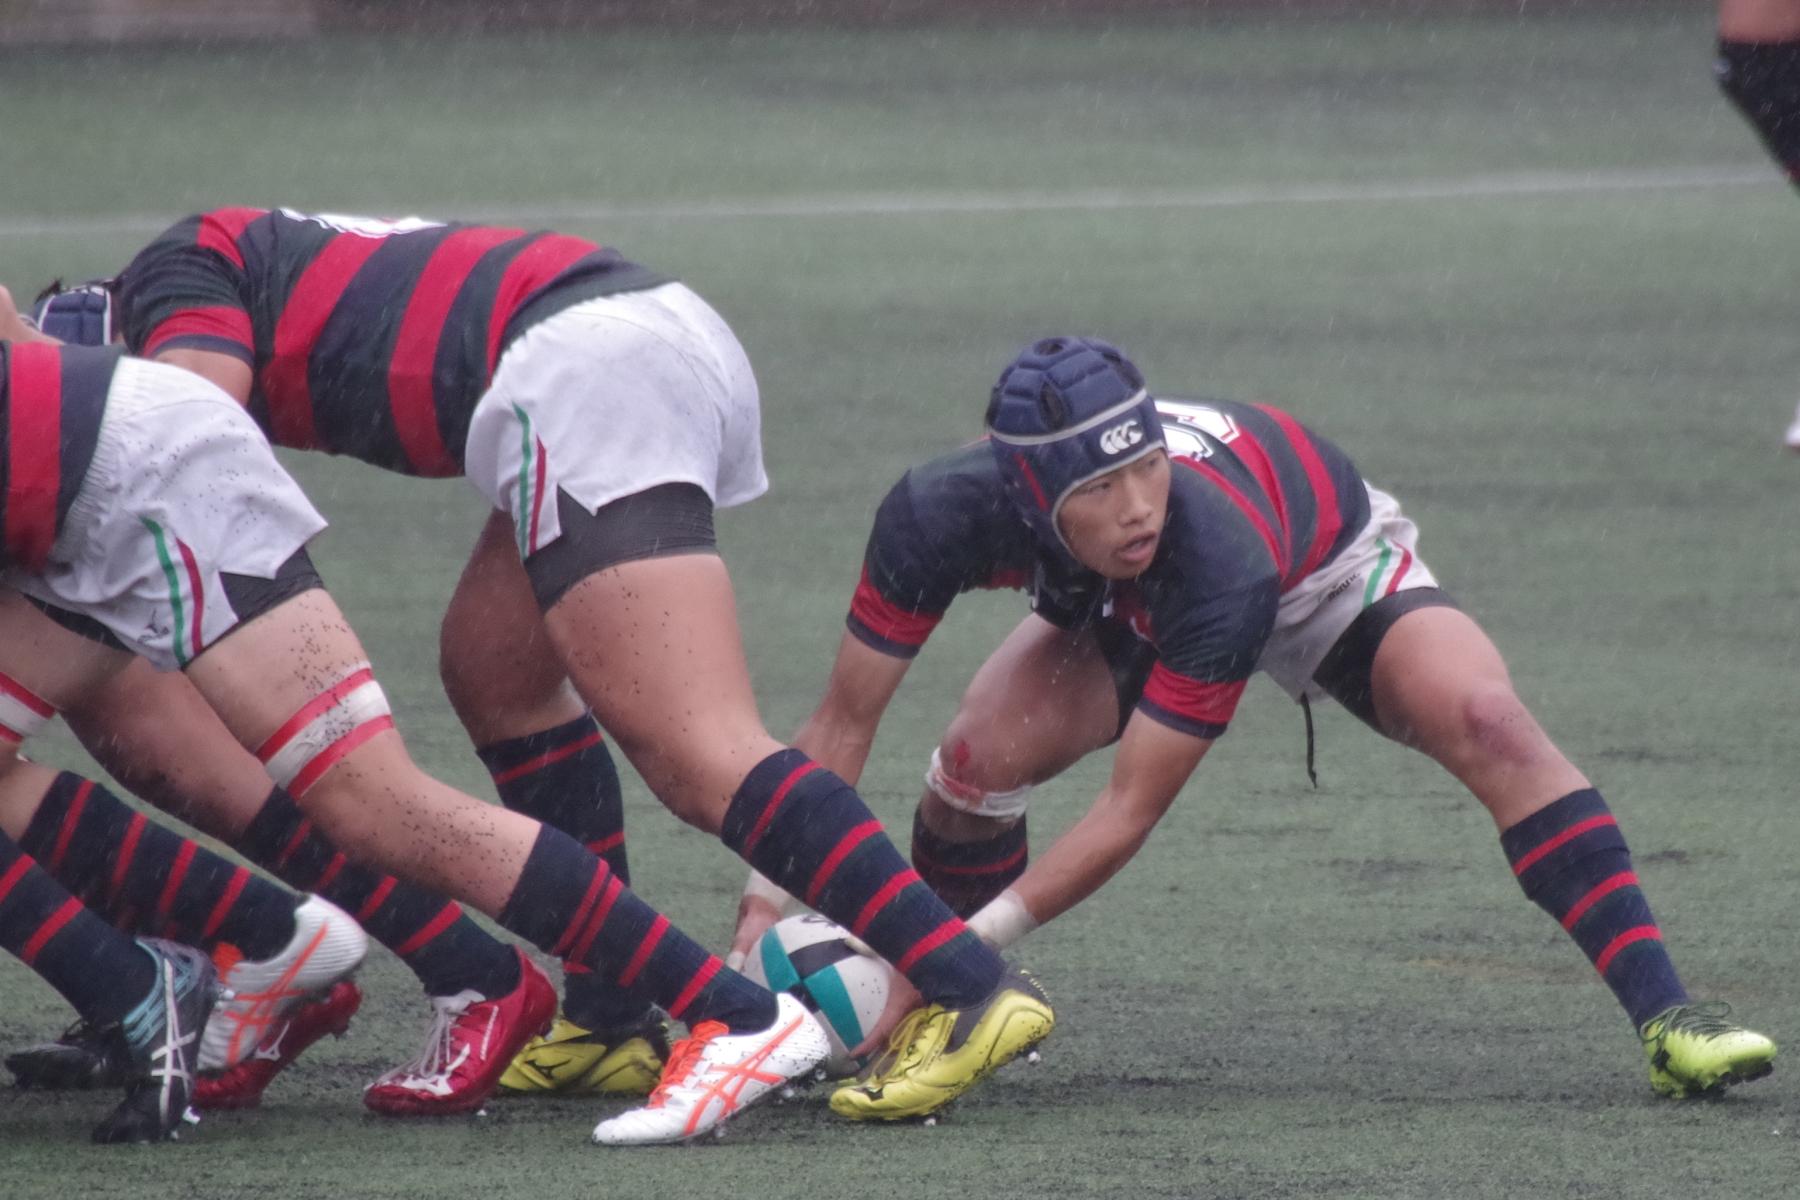 http://kokura-rugby.sakura.ne.jp/180513_140018_0287.jpg